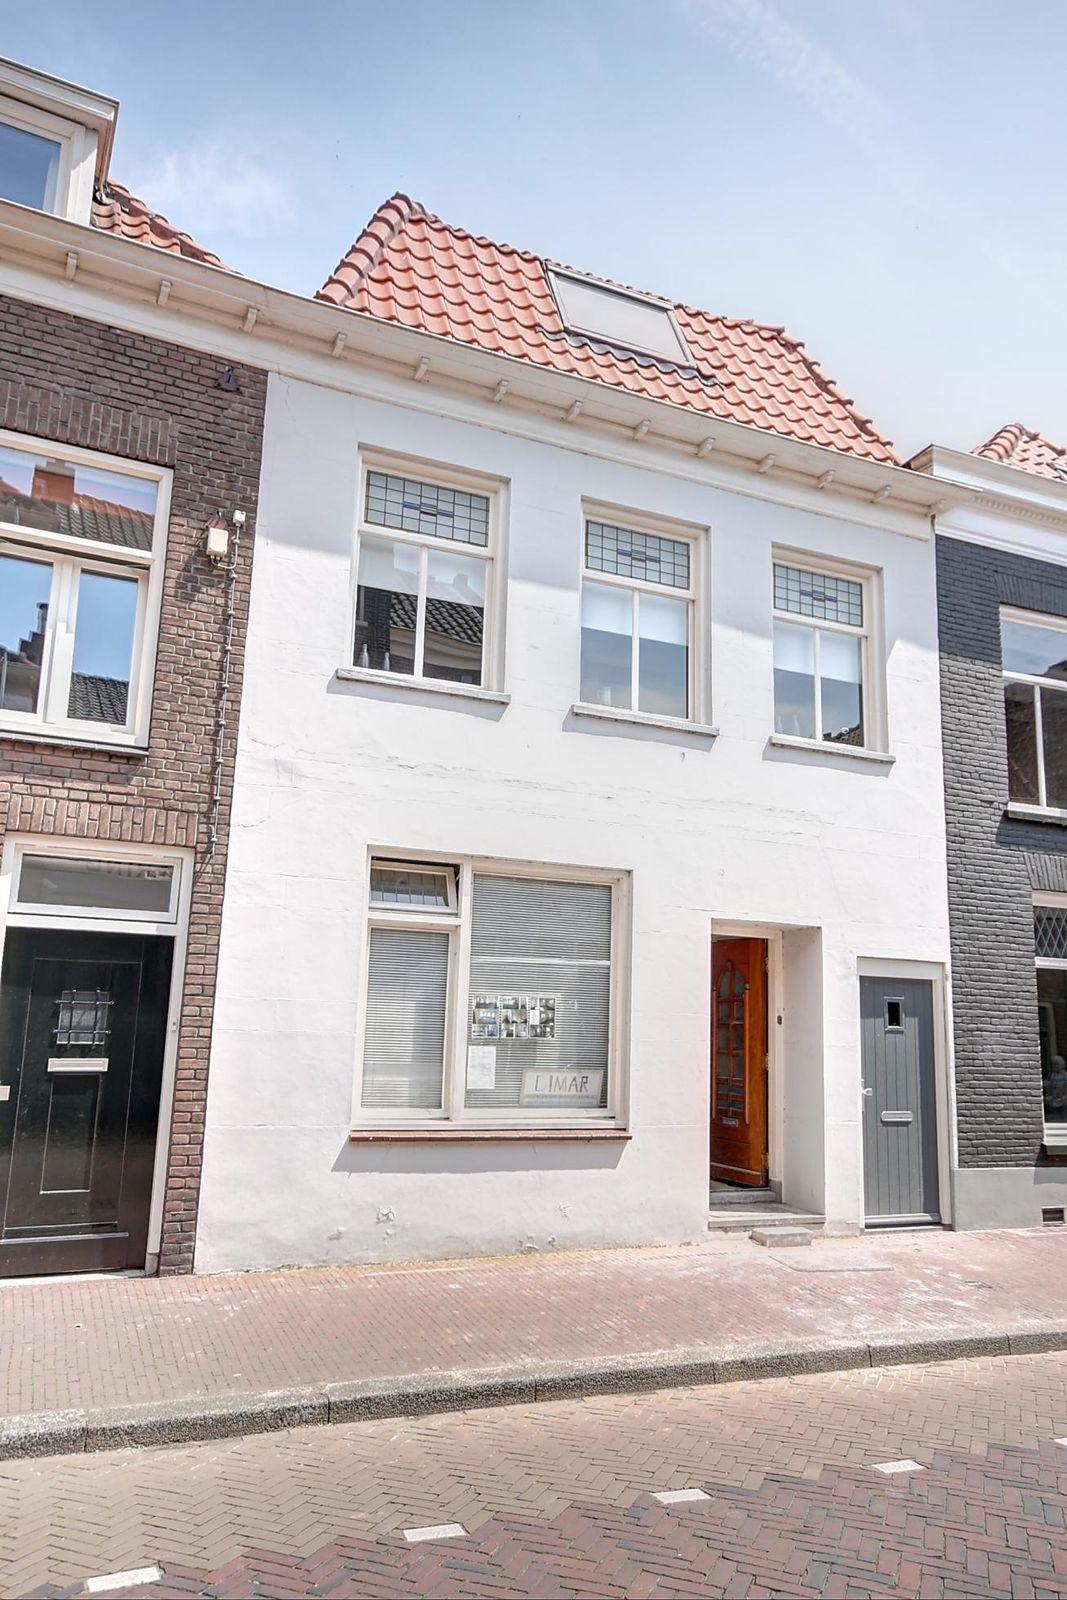 Boschstraat, Zaltbommel